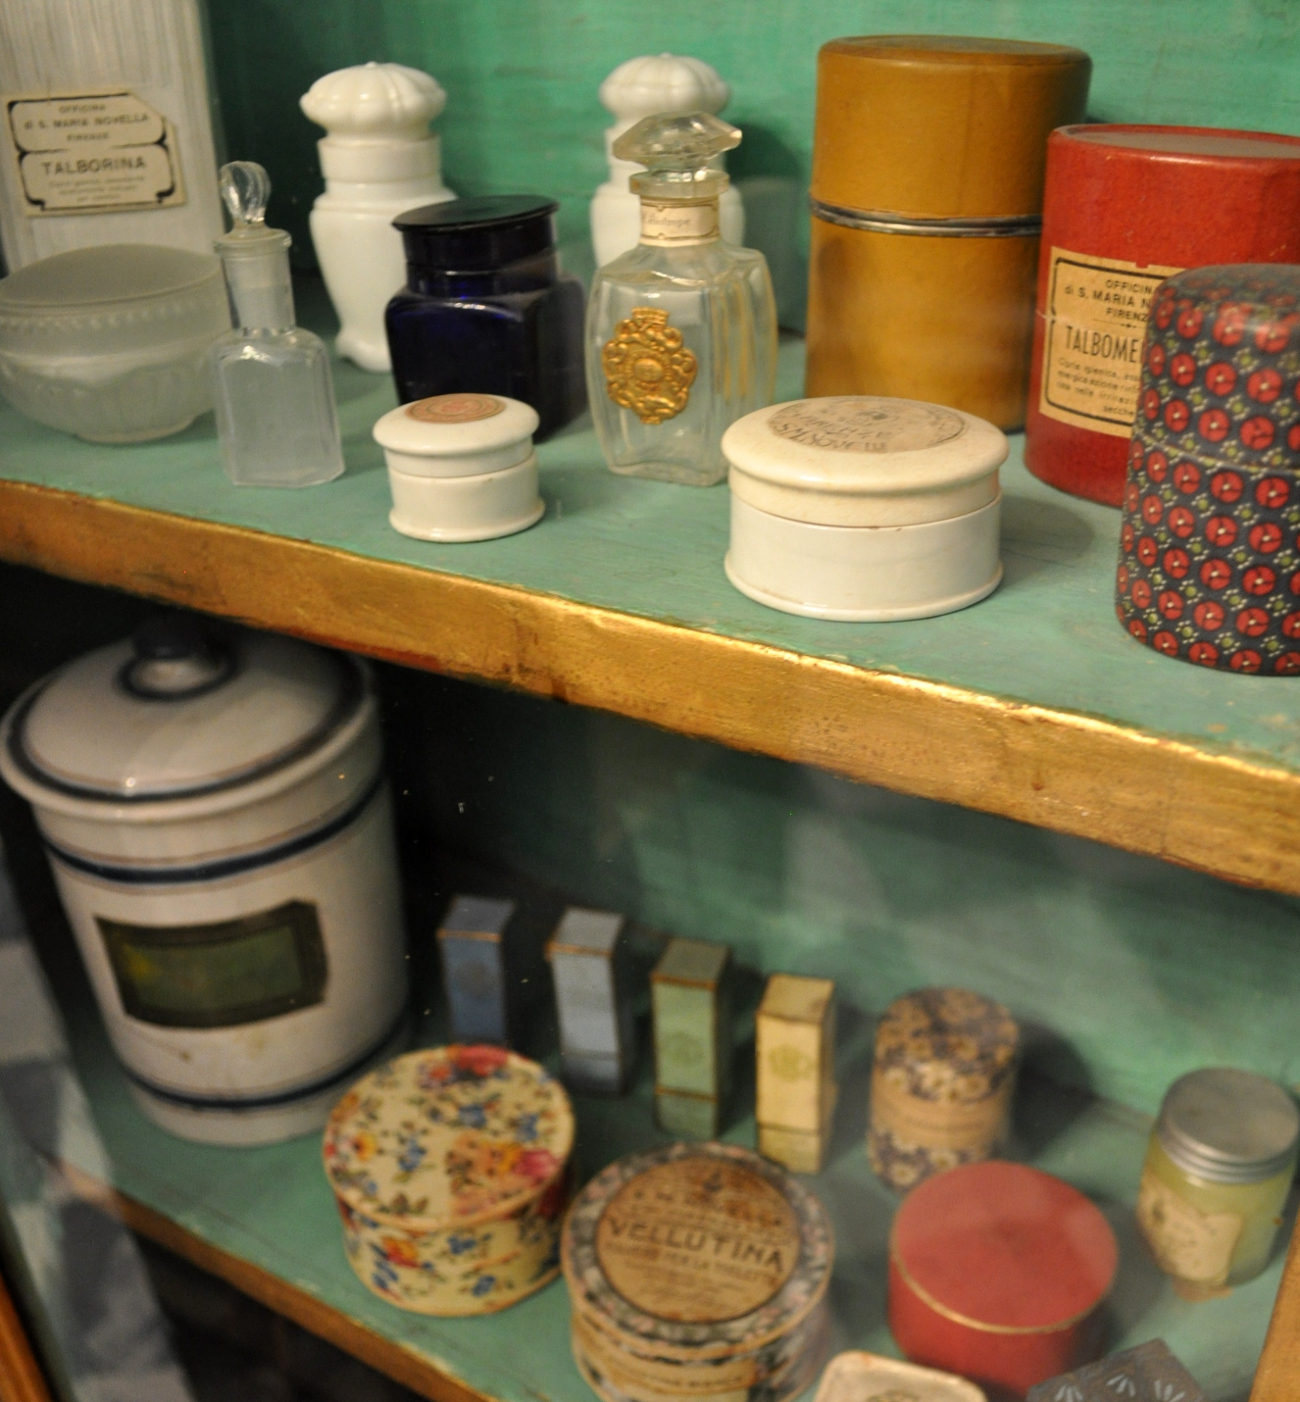 rocaille-blog-officina-profumo-farmaceutica-santa-maria-novella-shop-negozio-storico-sede-firenze-53